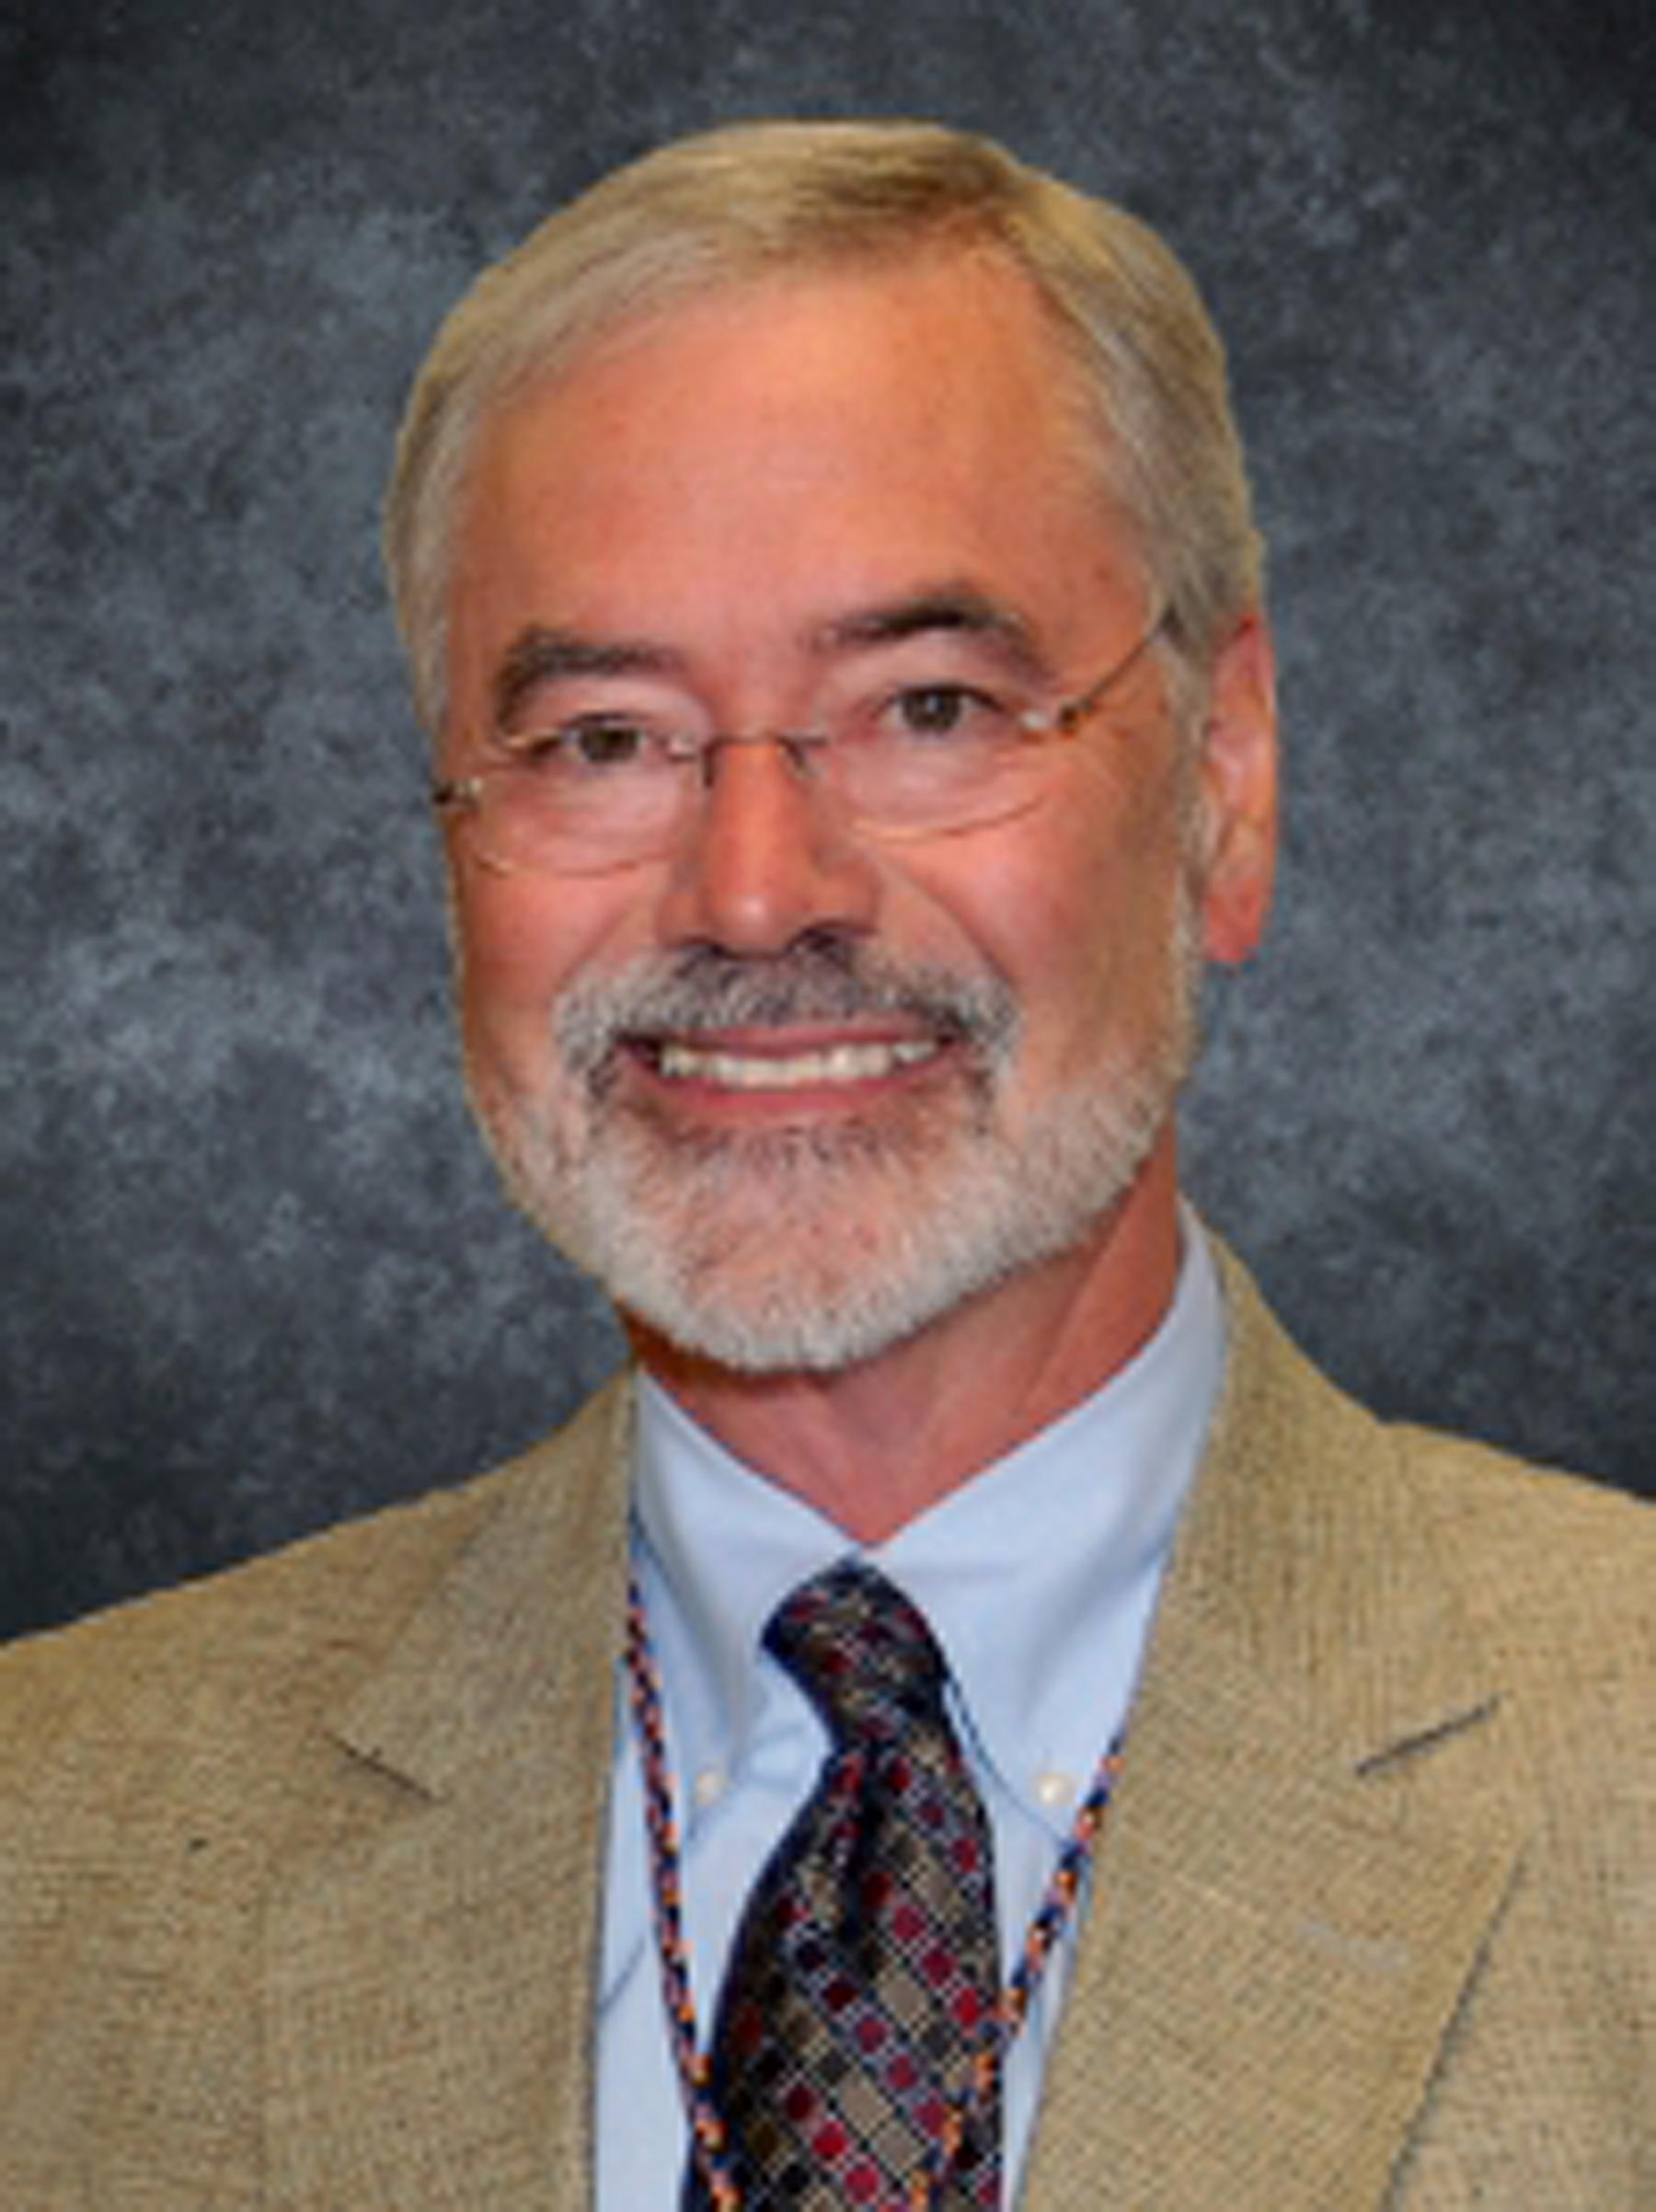 University of Utah Interim President and 2012 Honorary Degree Recipient, Dr. A. Lorris Betz